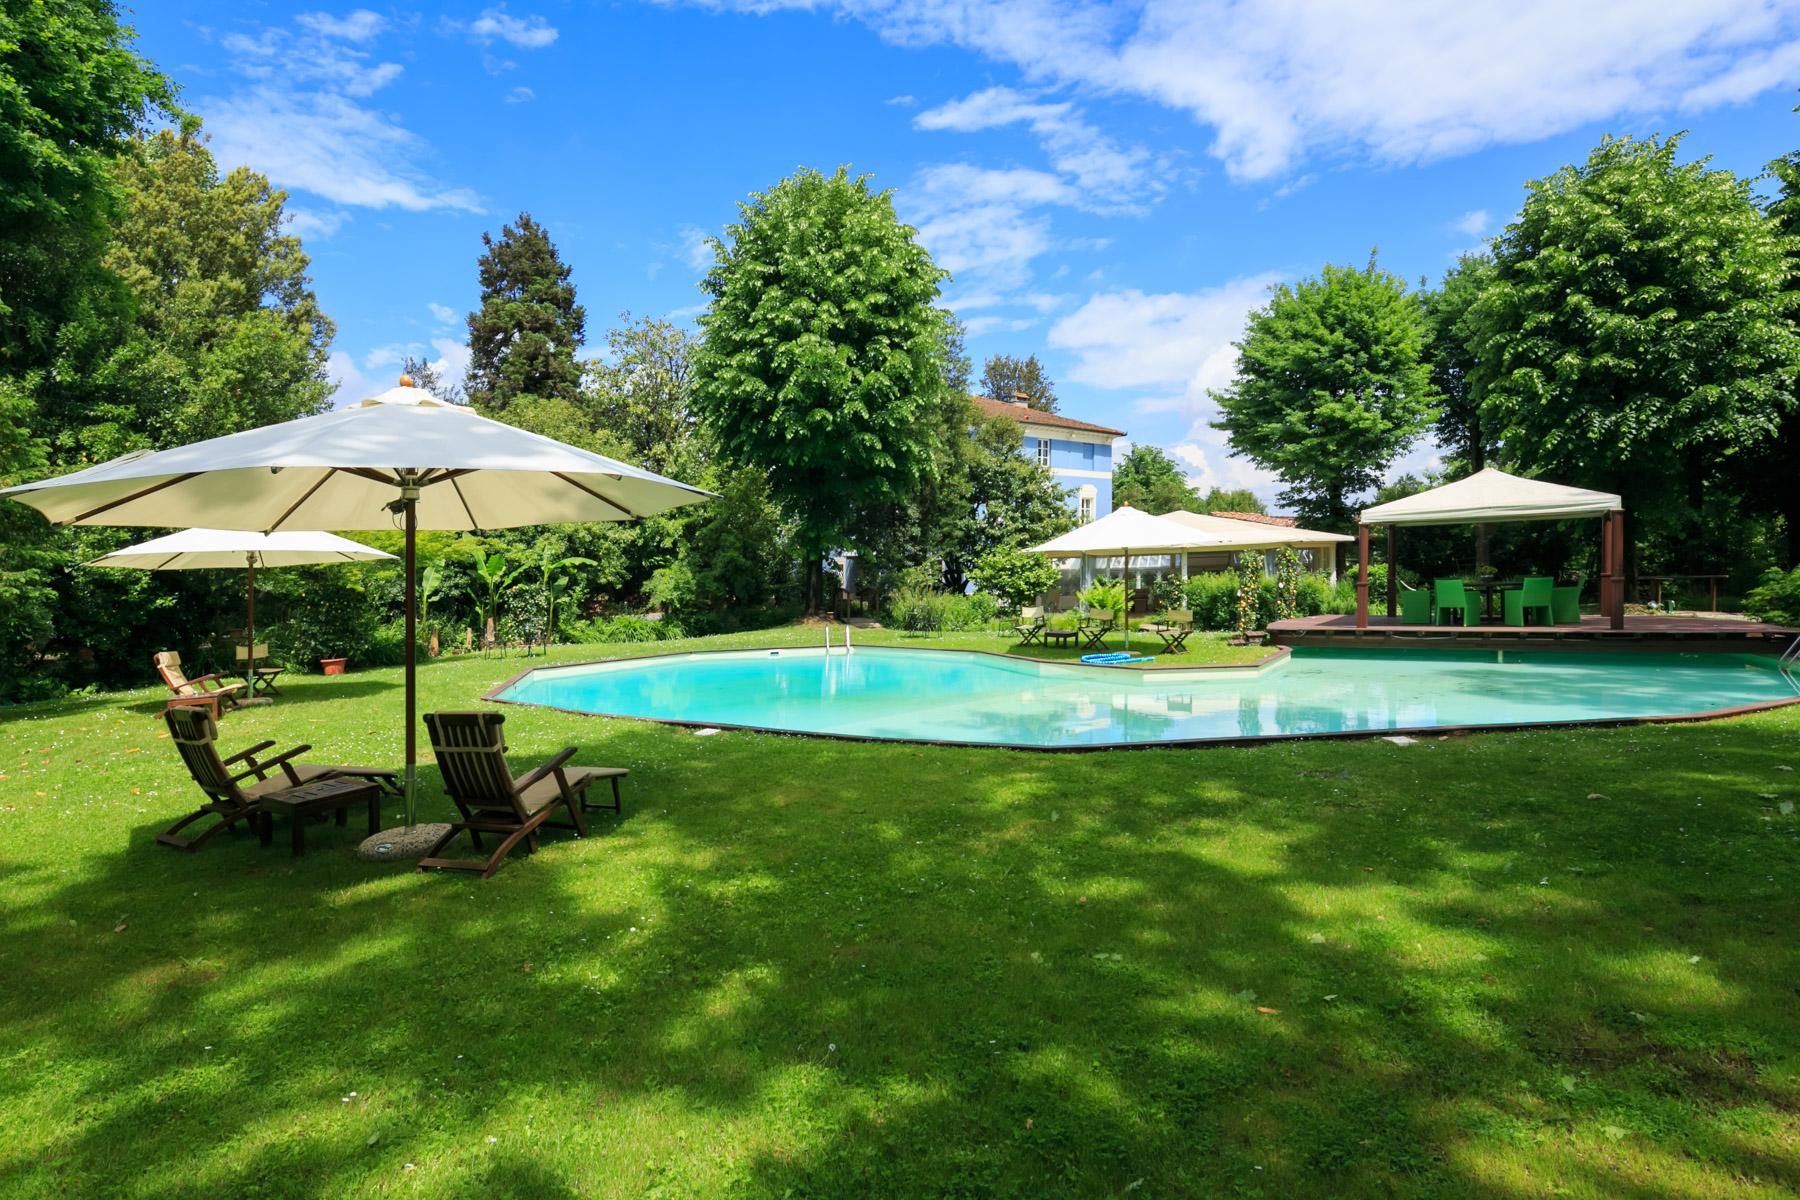 Villa in Vendita a Lucca: 5 locali, 700 mq - Foto 1